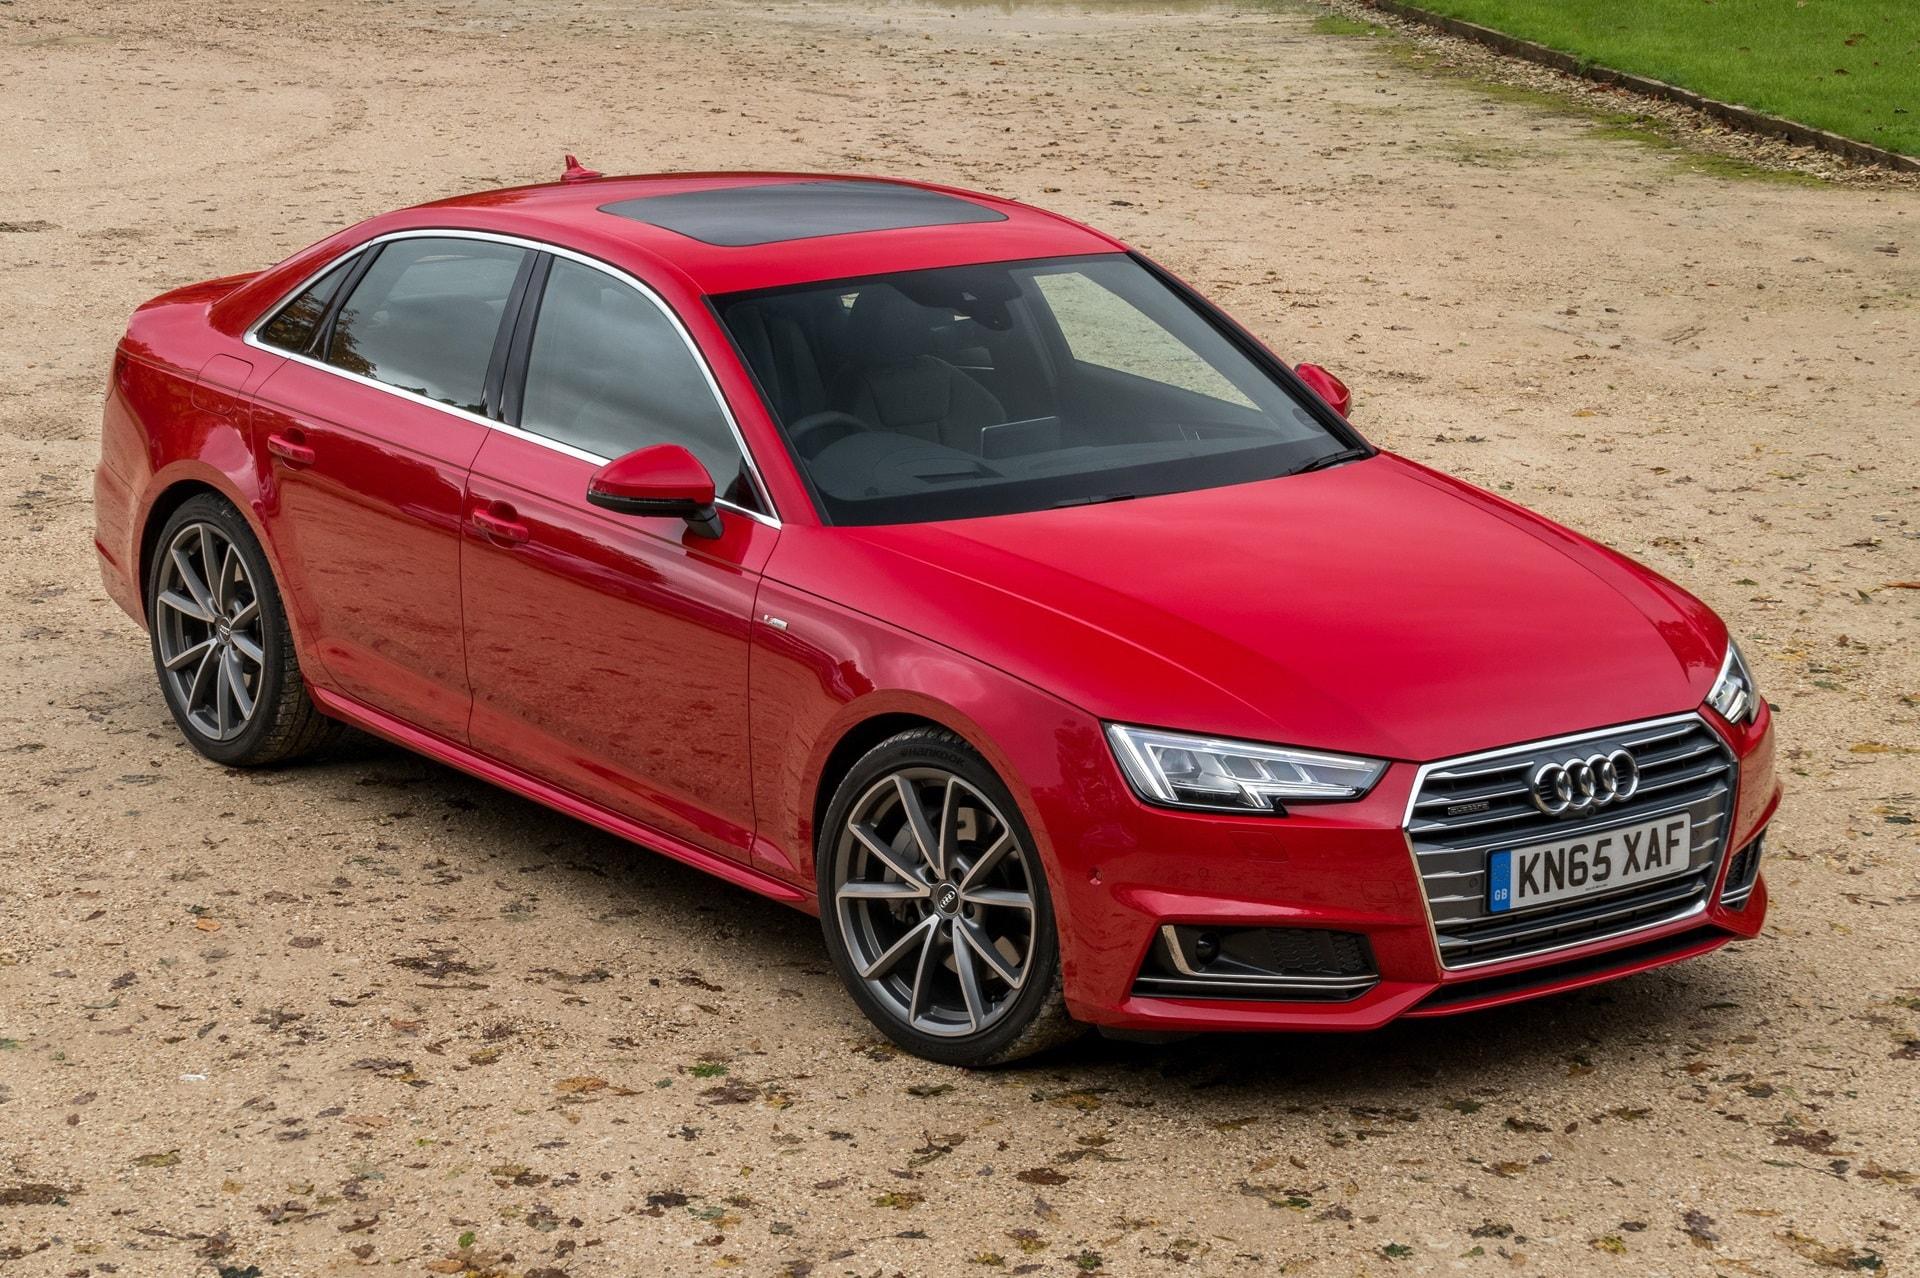 Audi A4 (B9) High